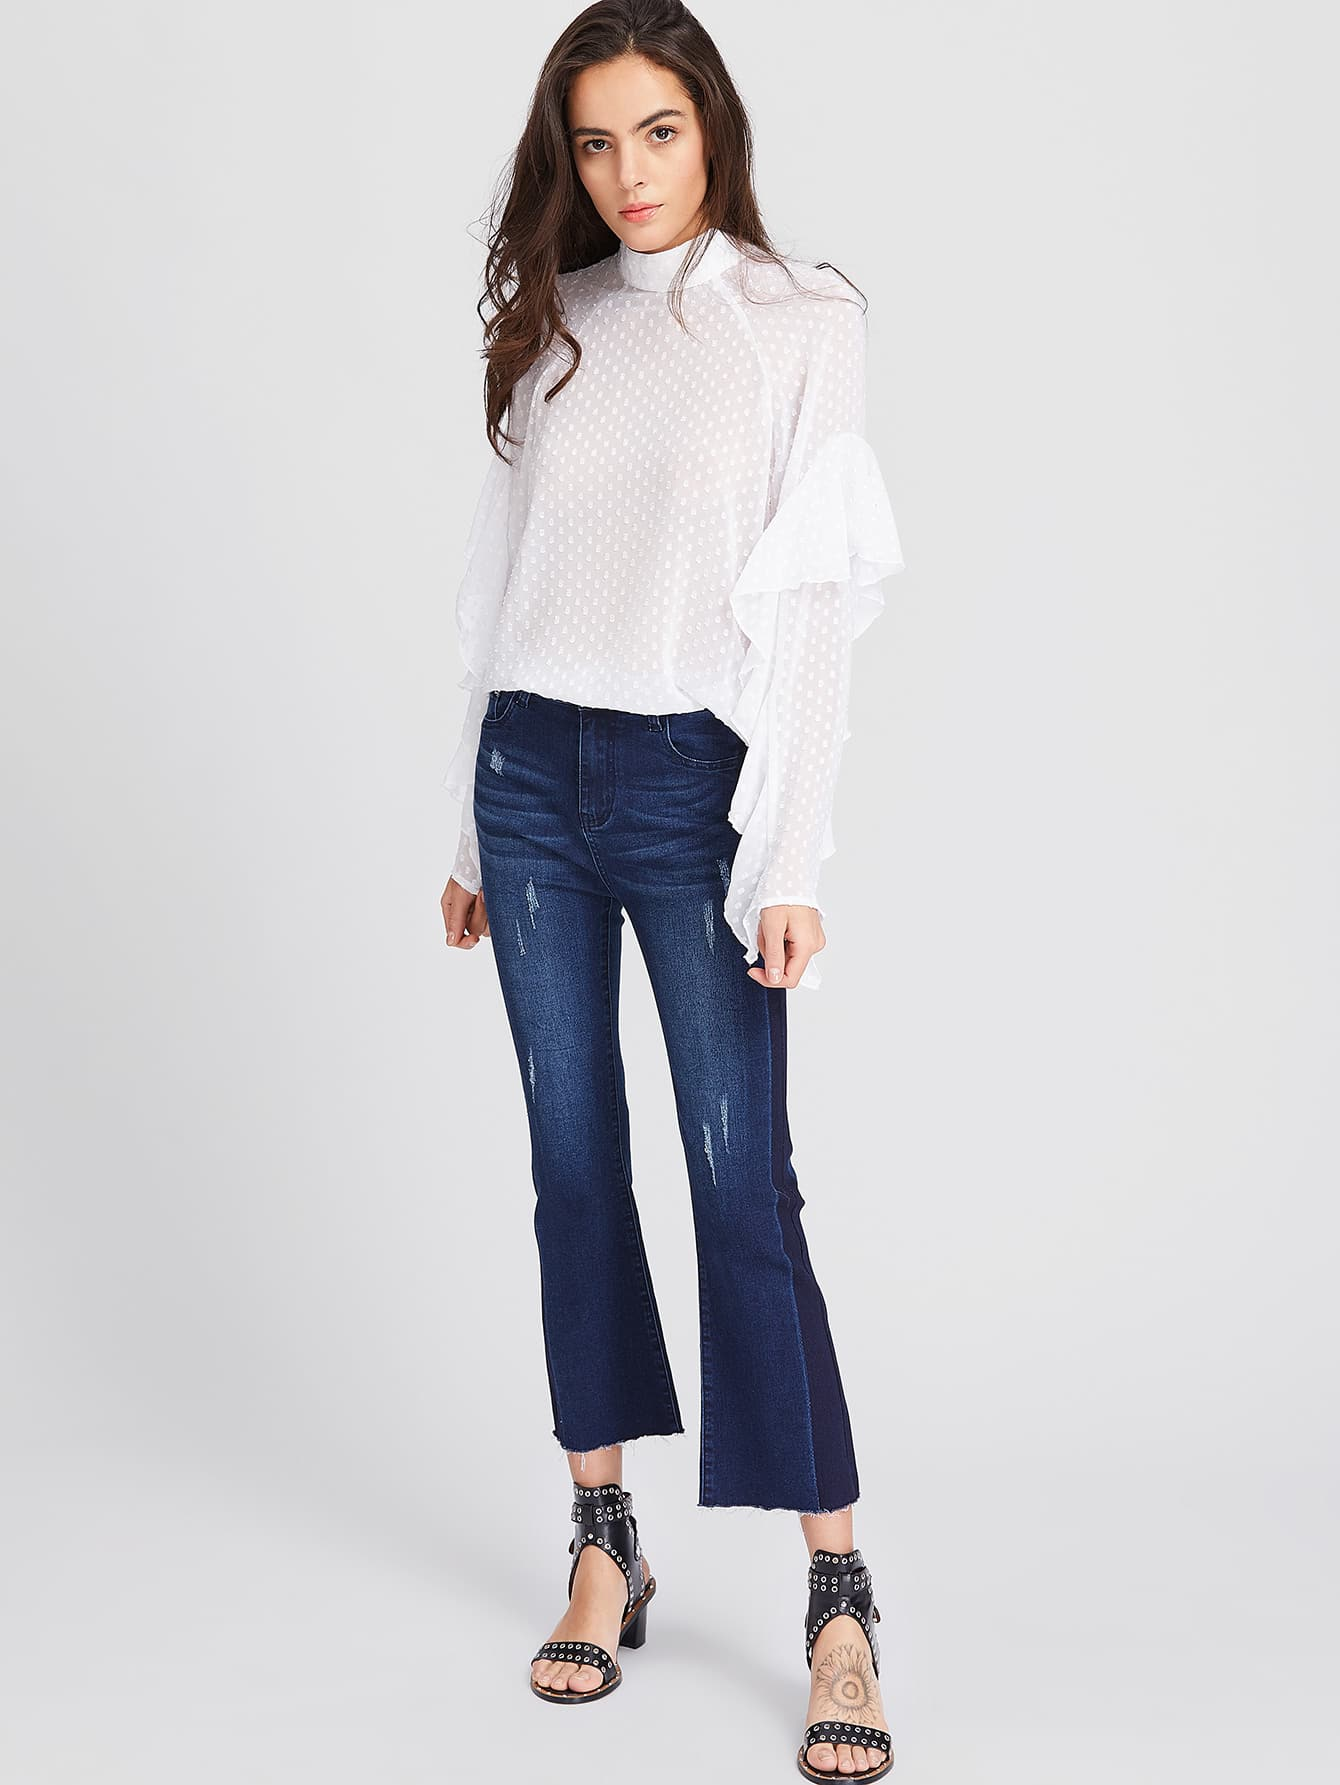 blouse161206702_2